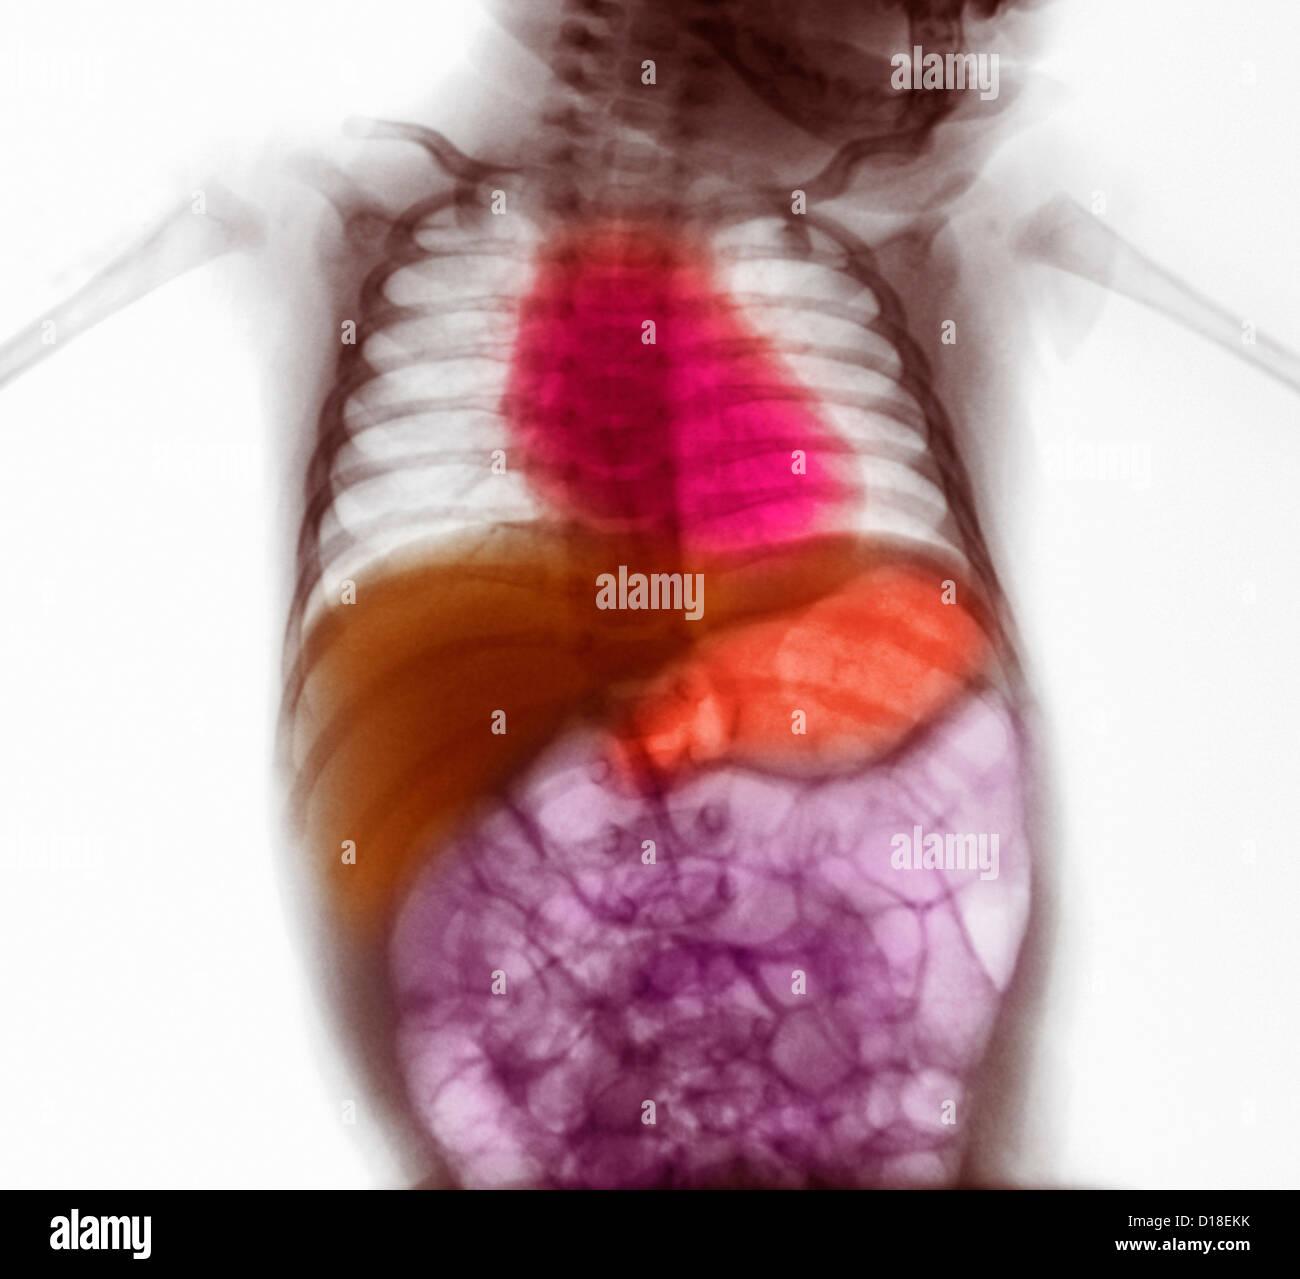 Abdominal X-ray of infant, viral gastroenteritis - Stock Image